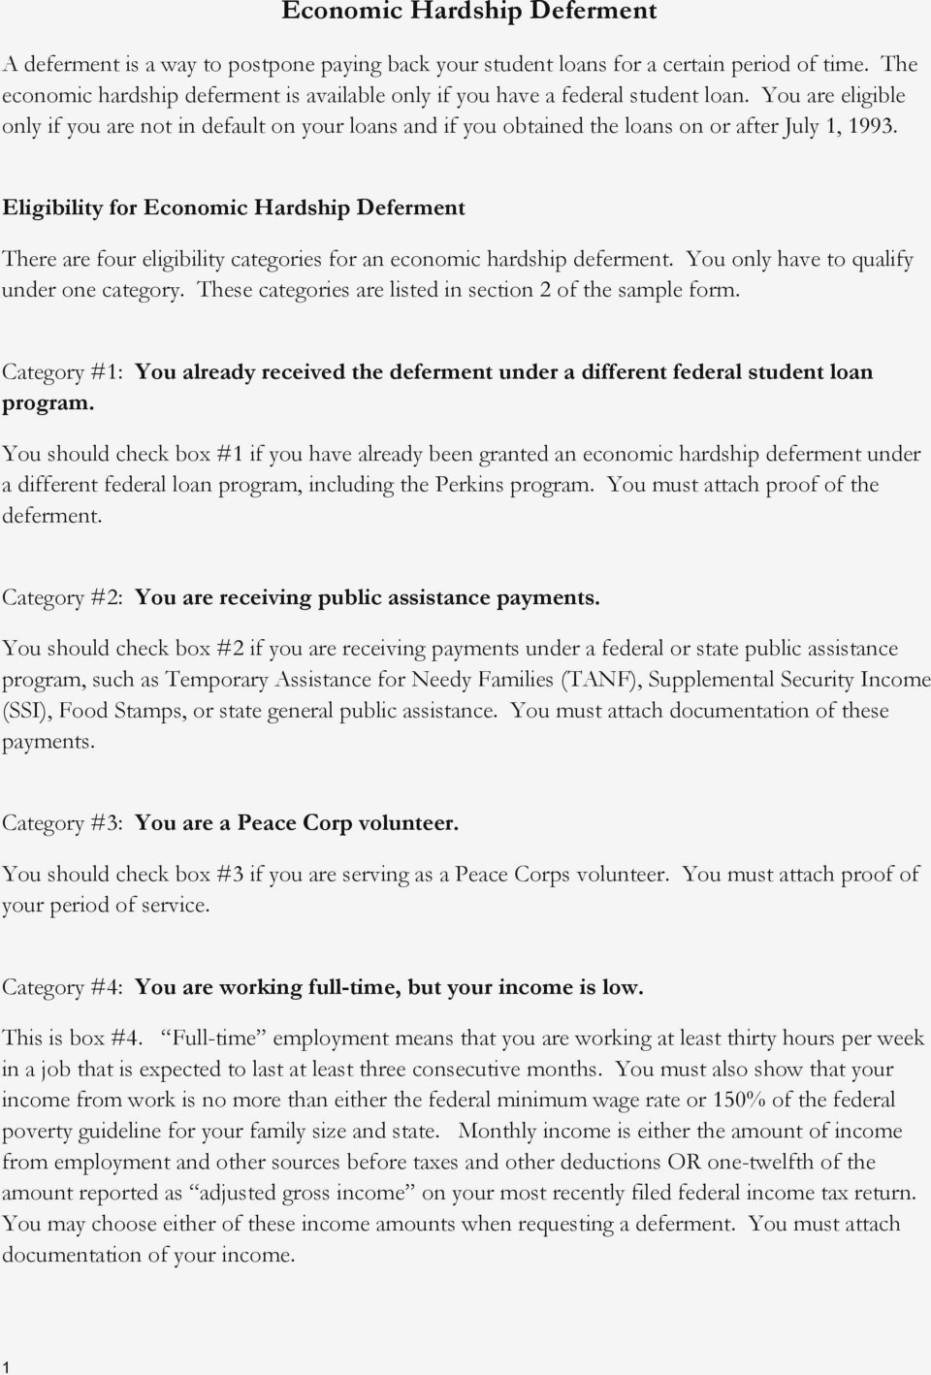 Federal Student Loan Hardship Form